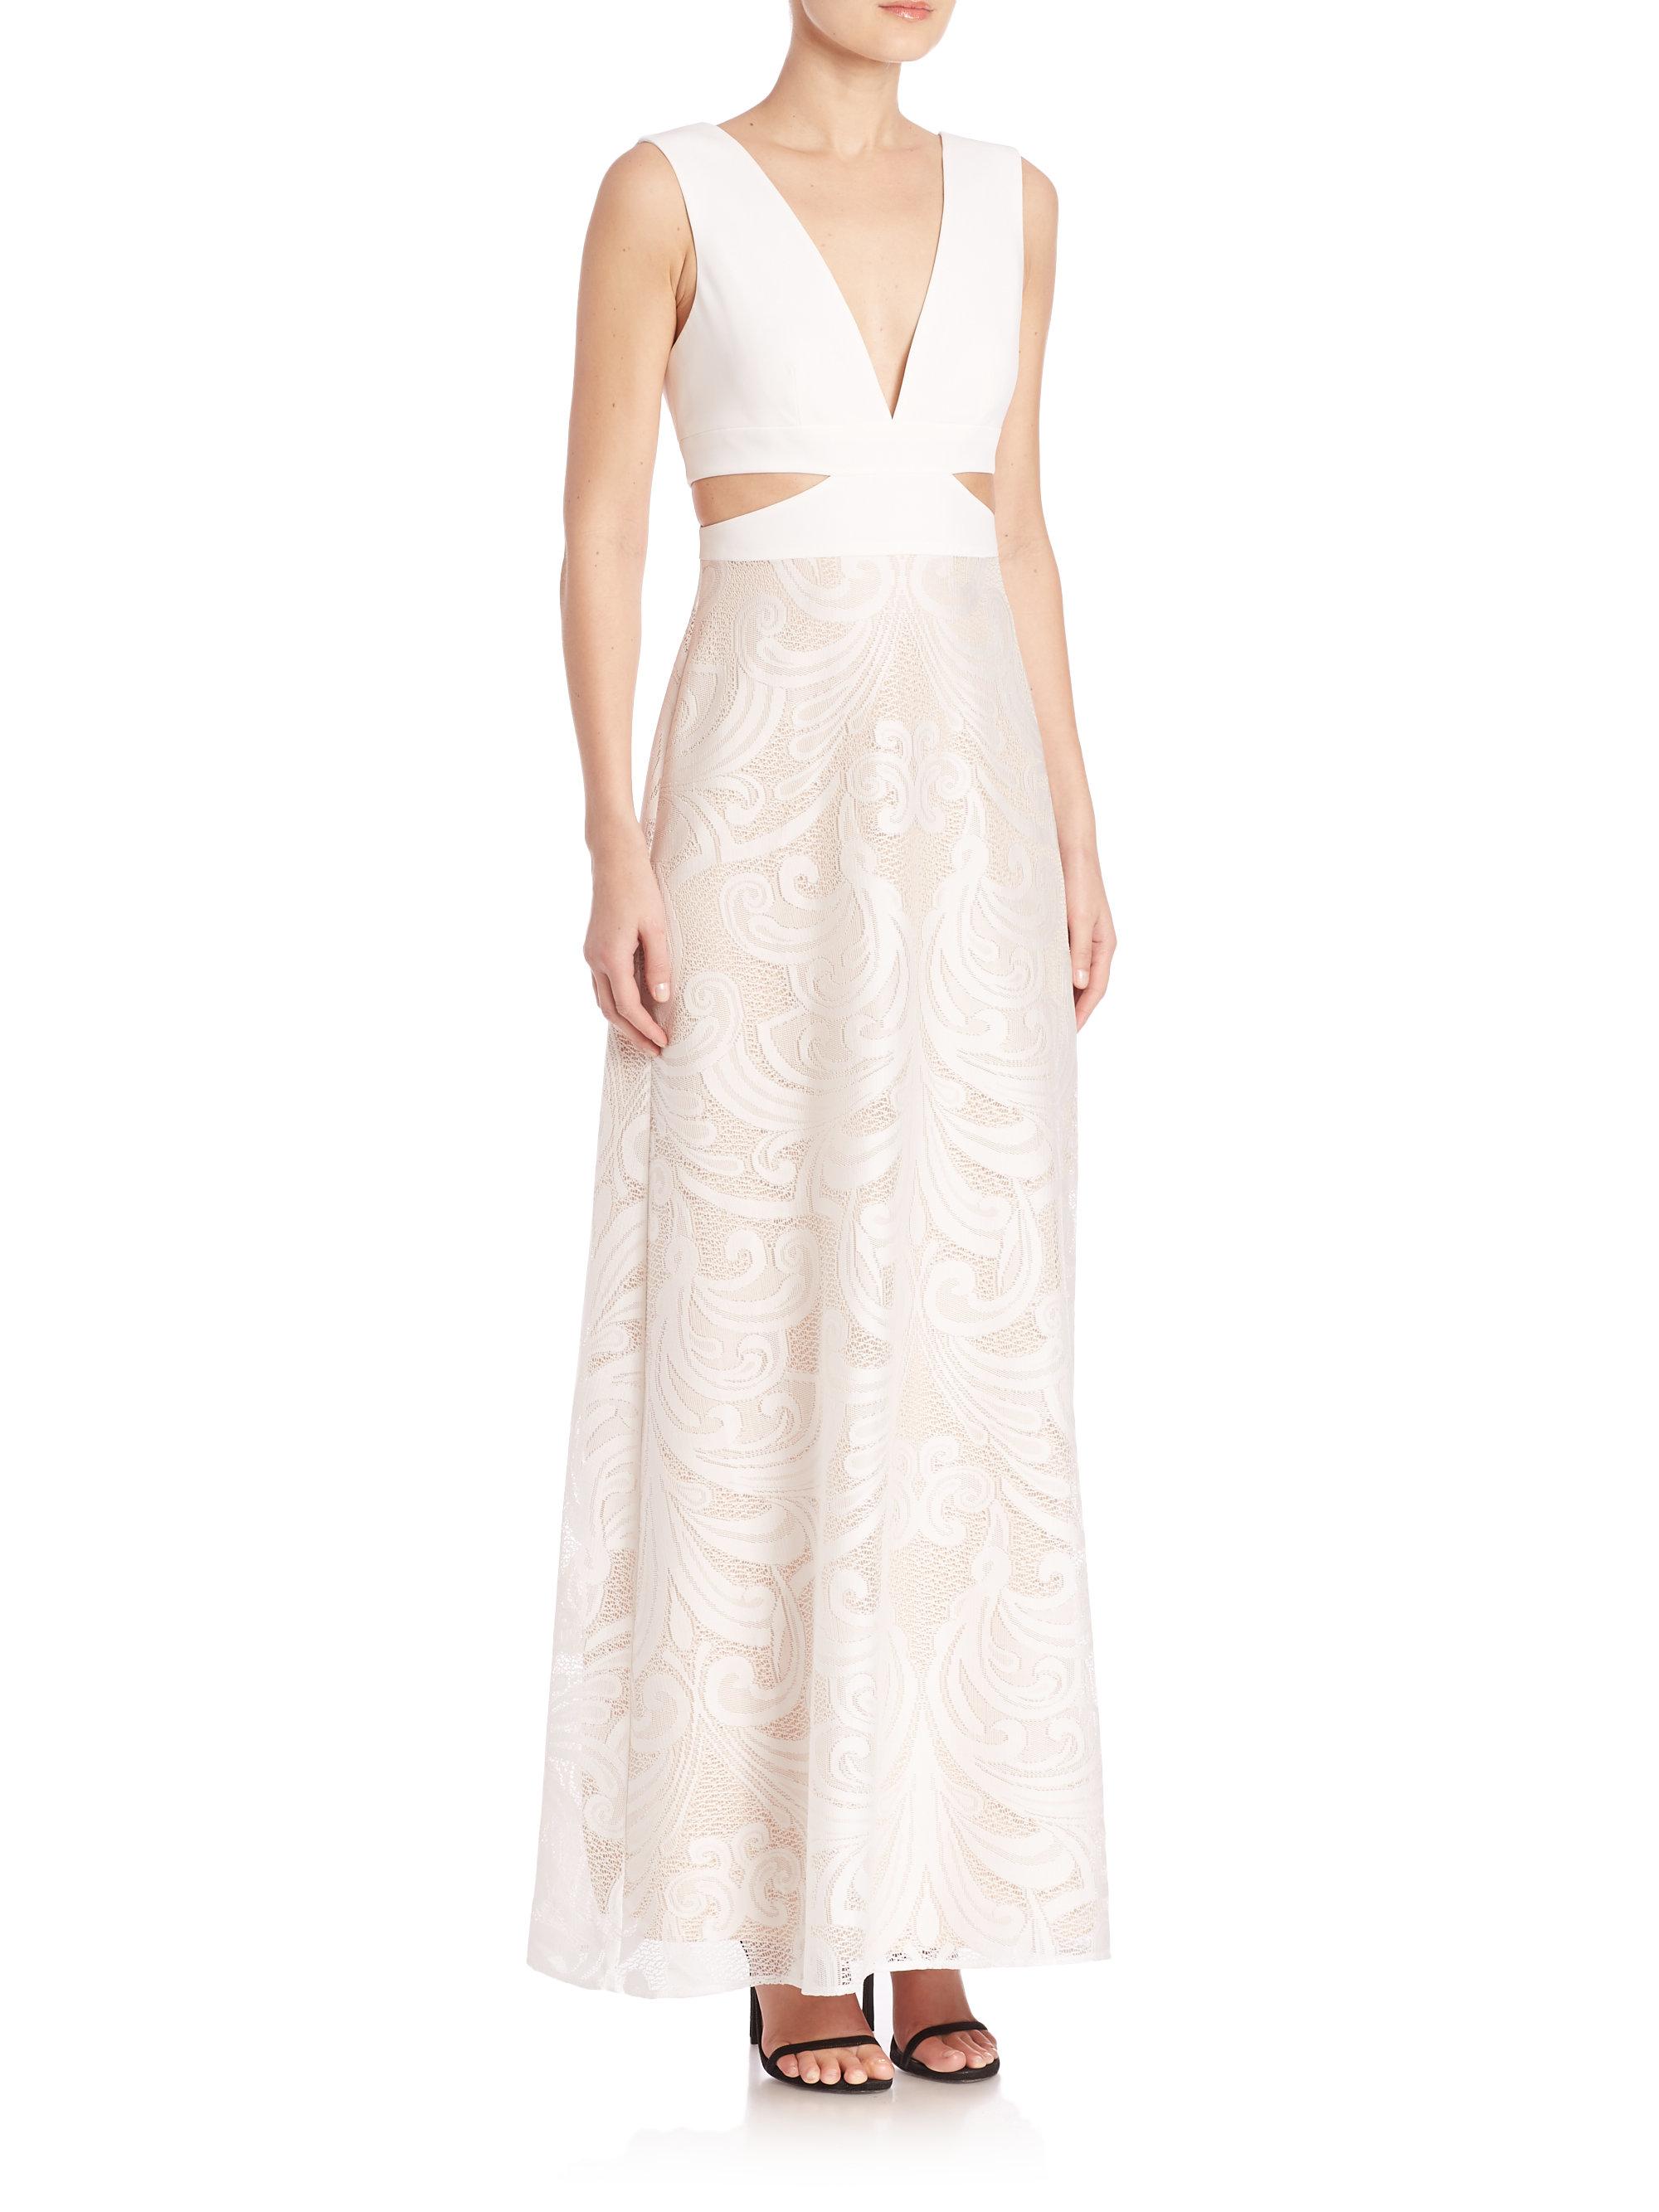 Lyst - Bcbgmaxazria Swirl Lace Cutout Gown in White